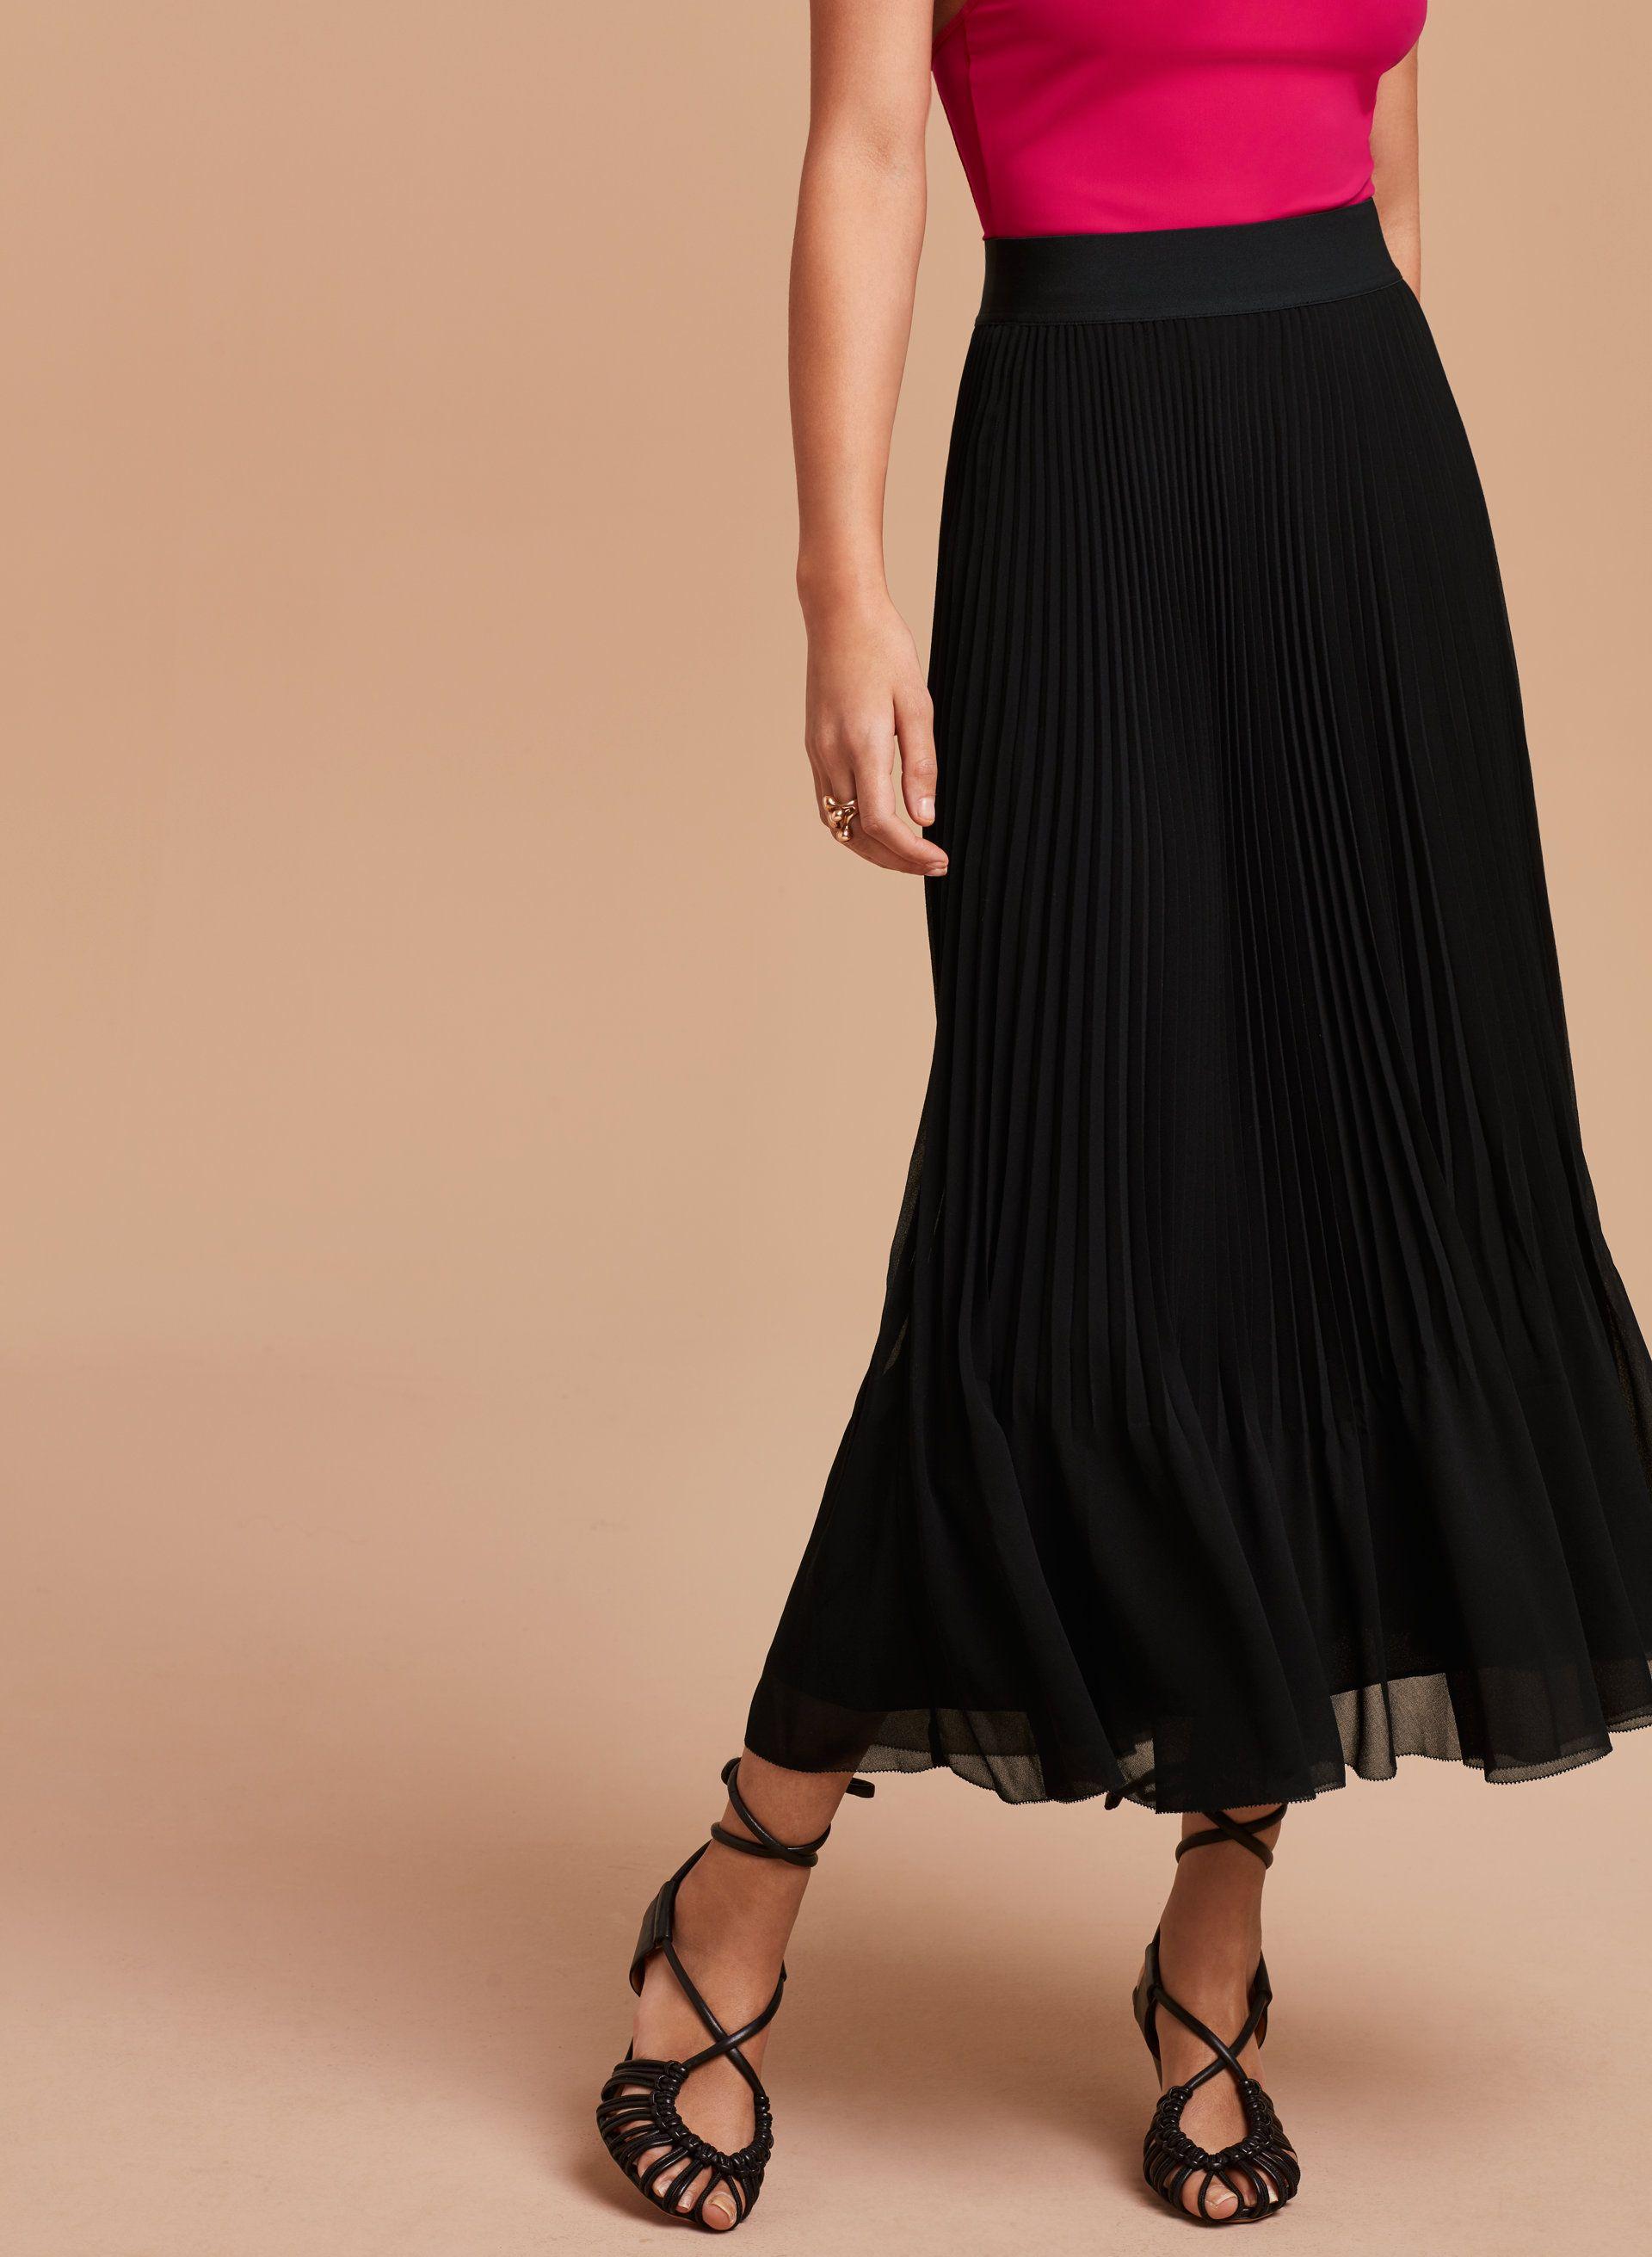 6fef828ab2 Terre skirt | Casual Wish List | Pleated Skirt, Skirts, Fashion